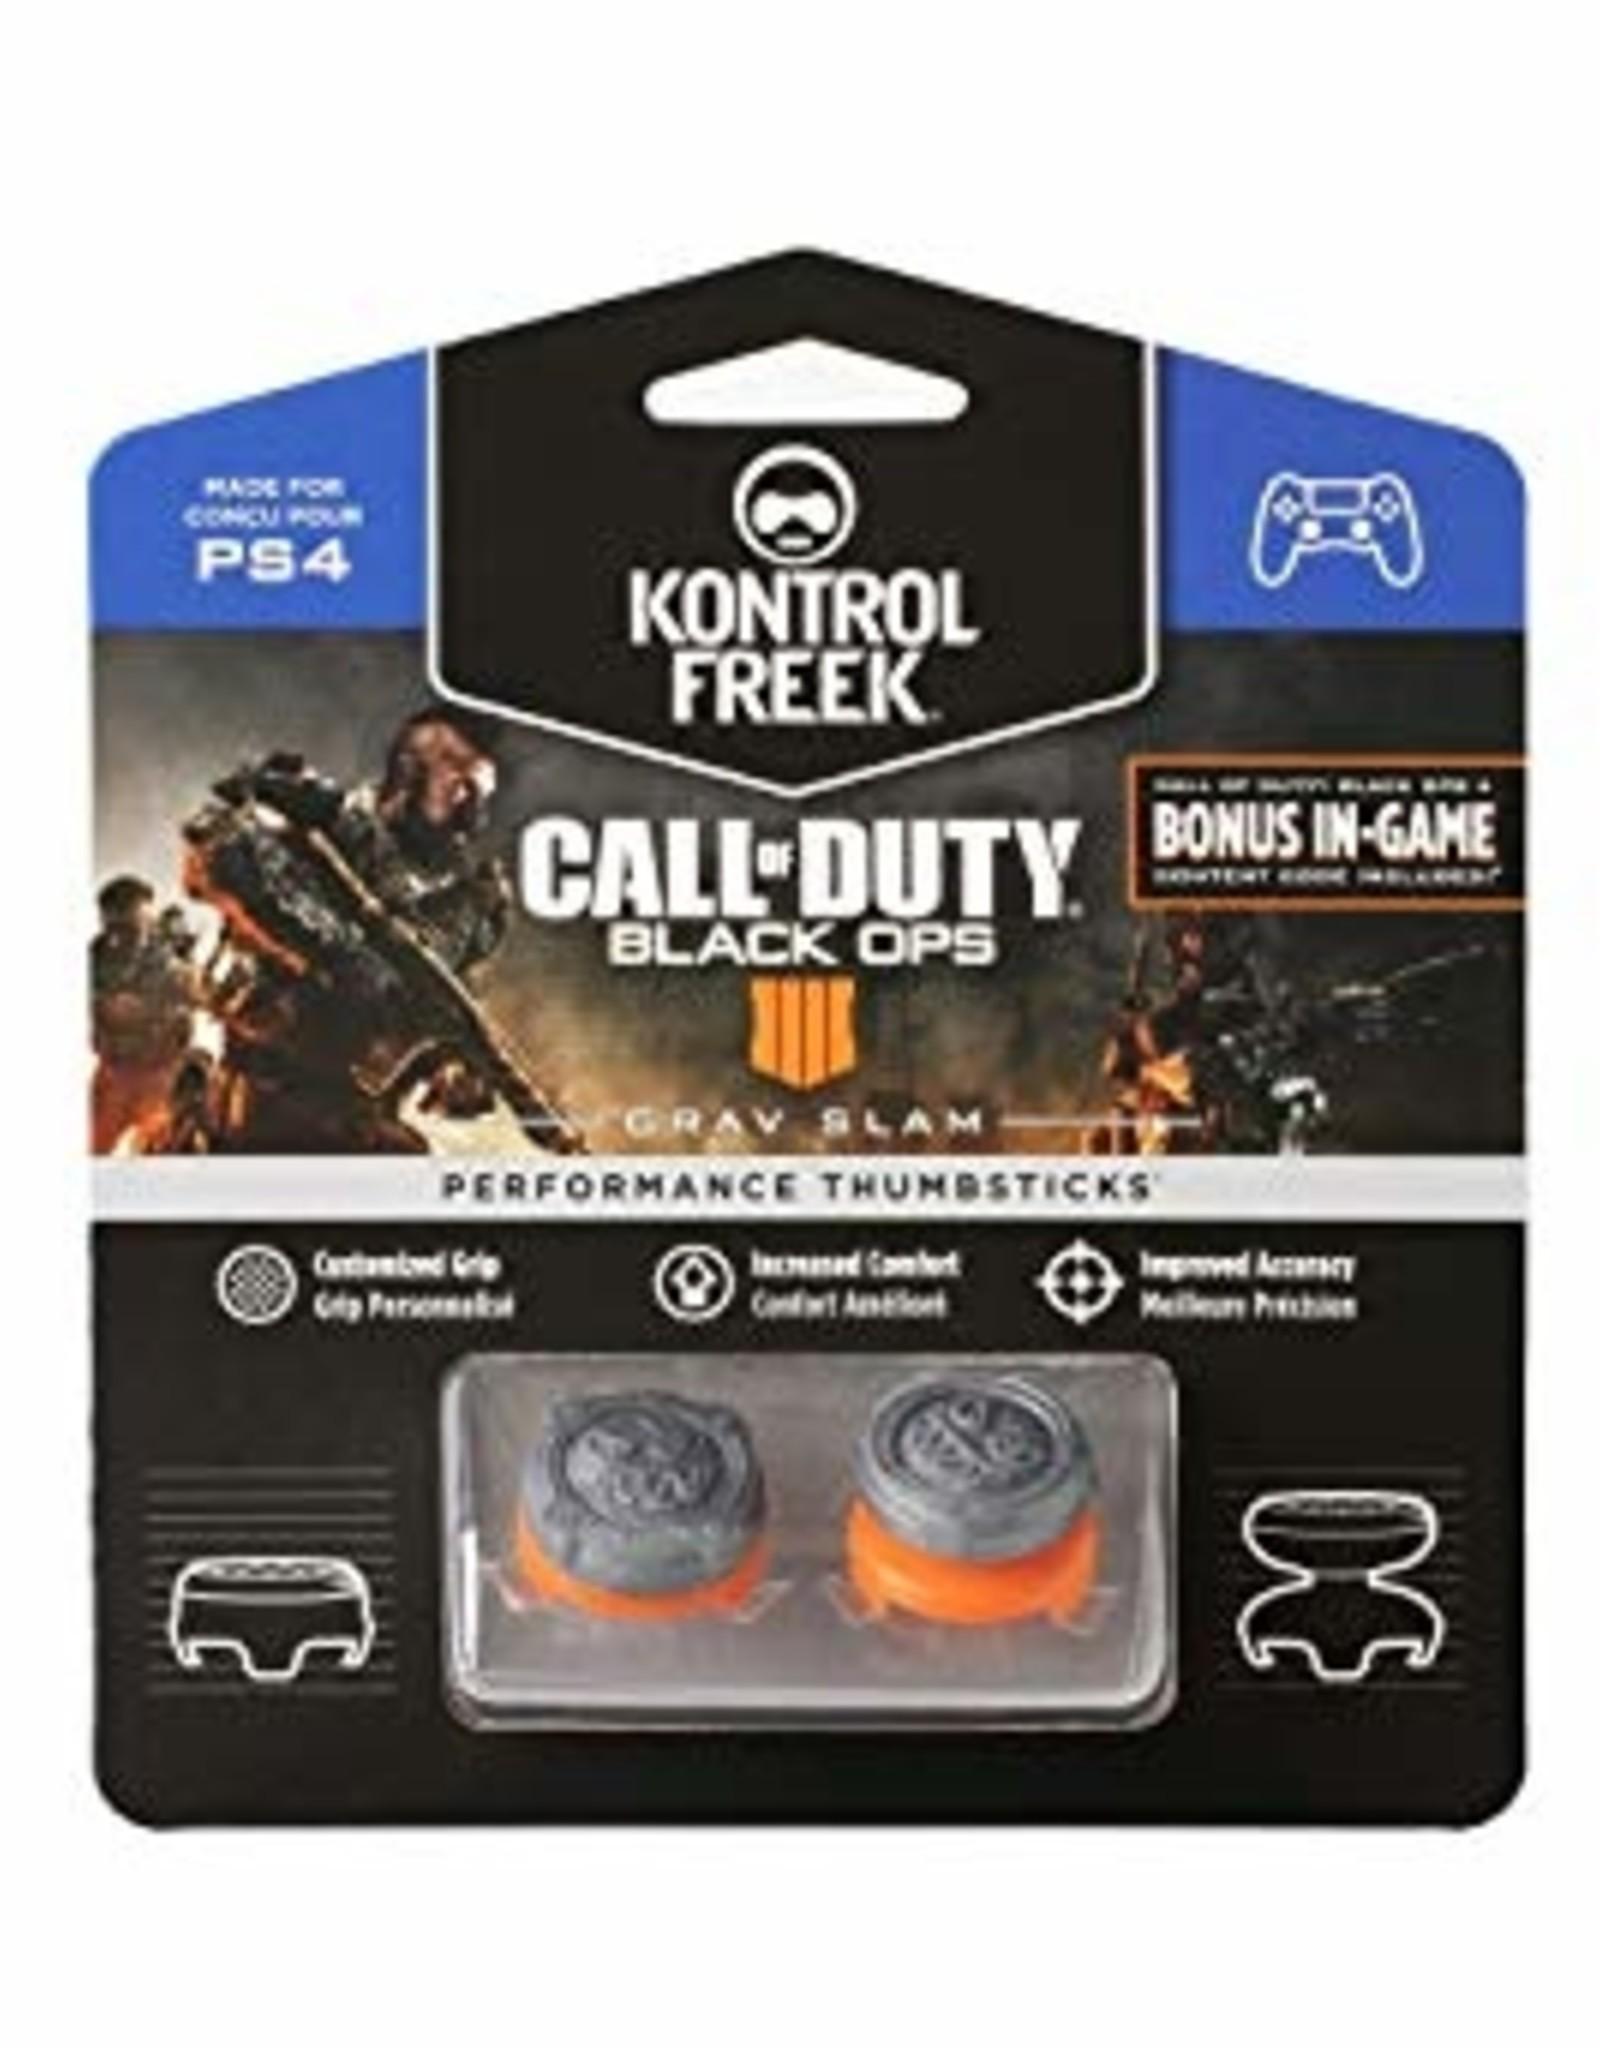 KontrolFreek PS4 FPS CoD Black Ops 4 Grav Slam 1 High Rise 1 Mid Rise Thumb Grip Analog Cover